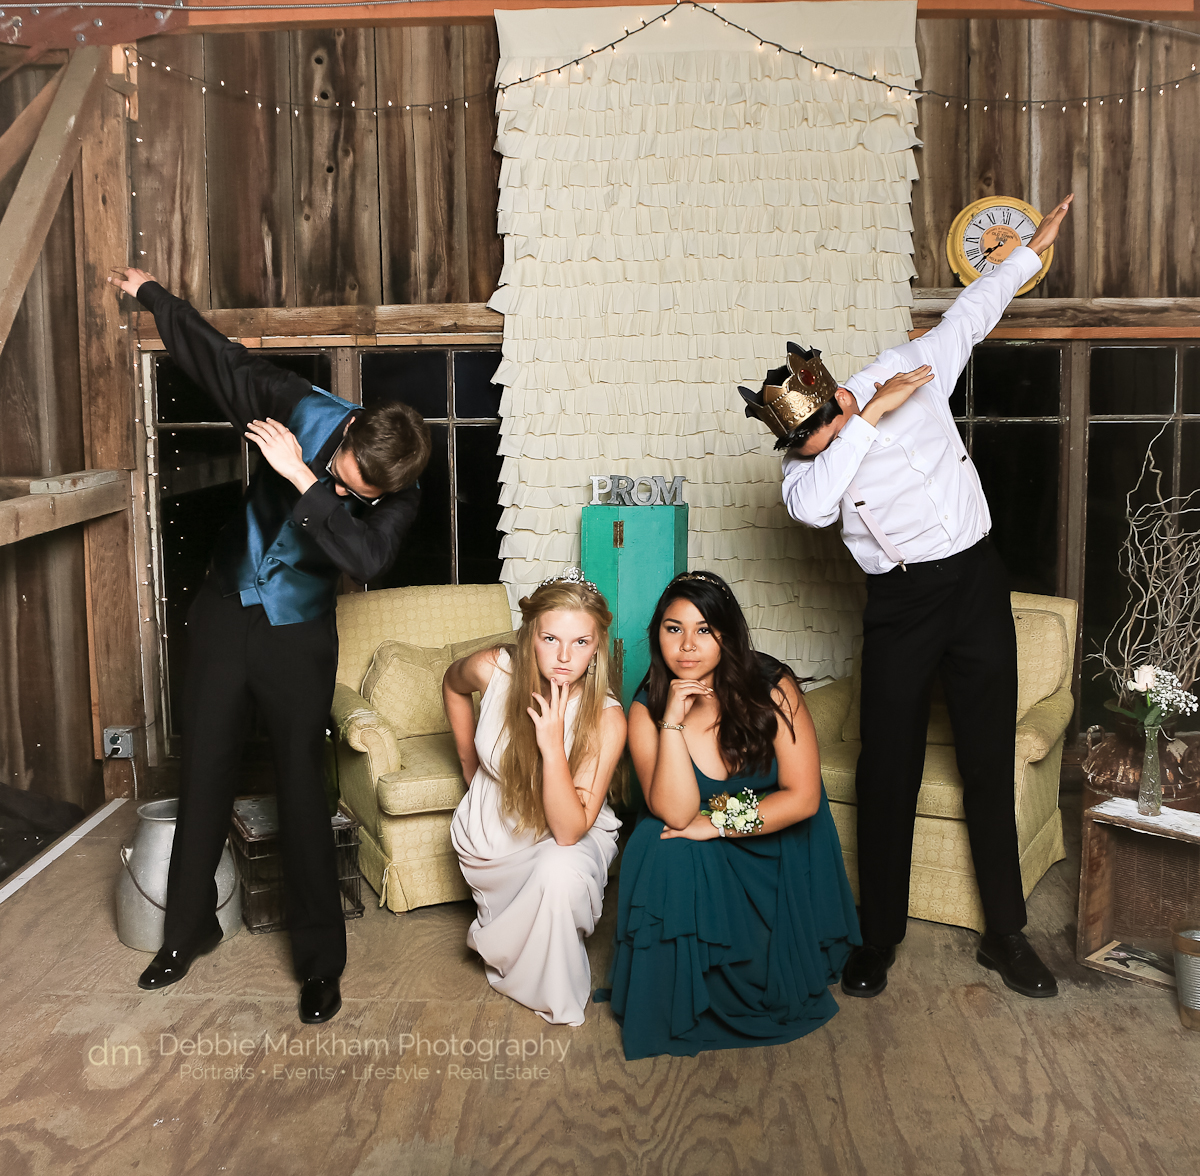 high-school-prom_event-photographer_cambria_morro-bay_san-luis-obispo_local_fun_prom-photos-4253